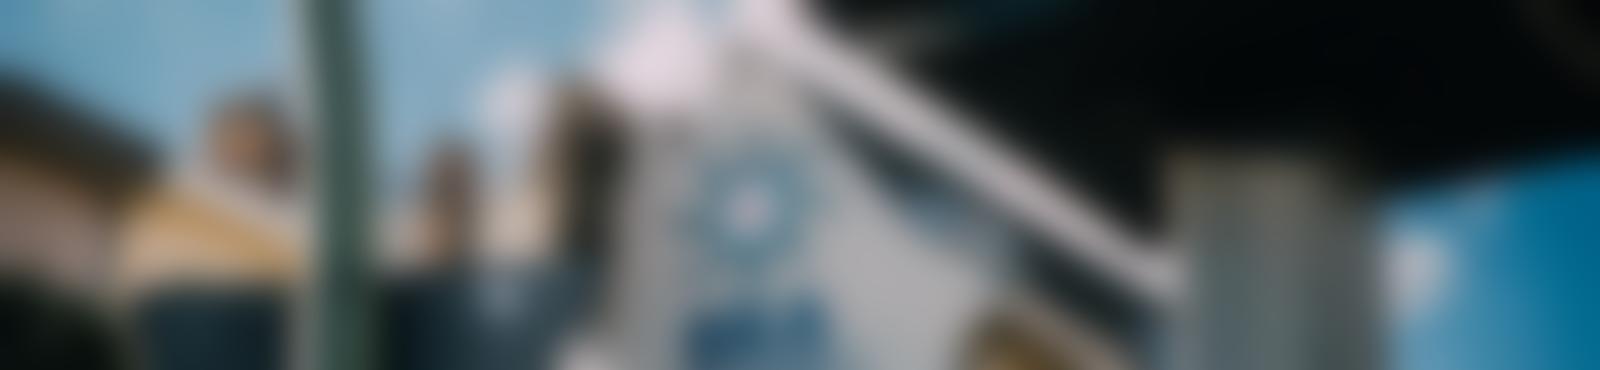 Blurred 4f5fba07 4942 47bc 8f4c 02ef4099118c